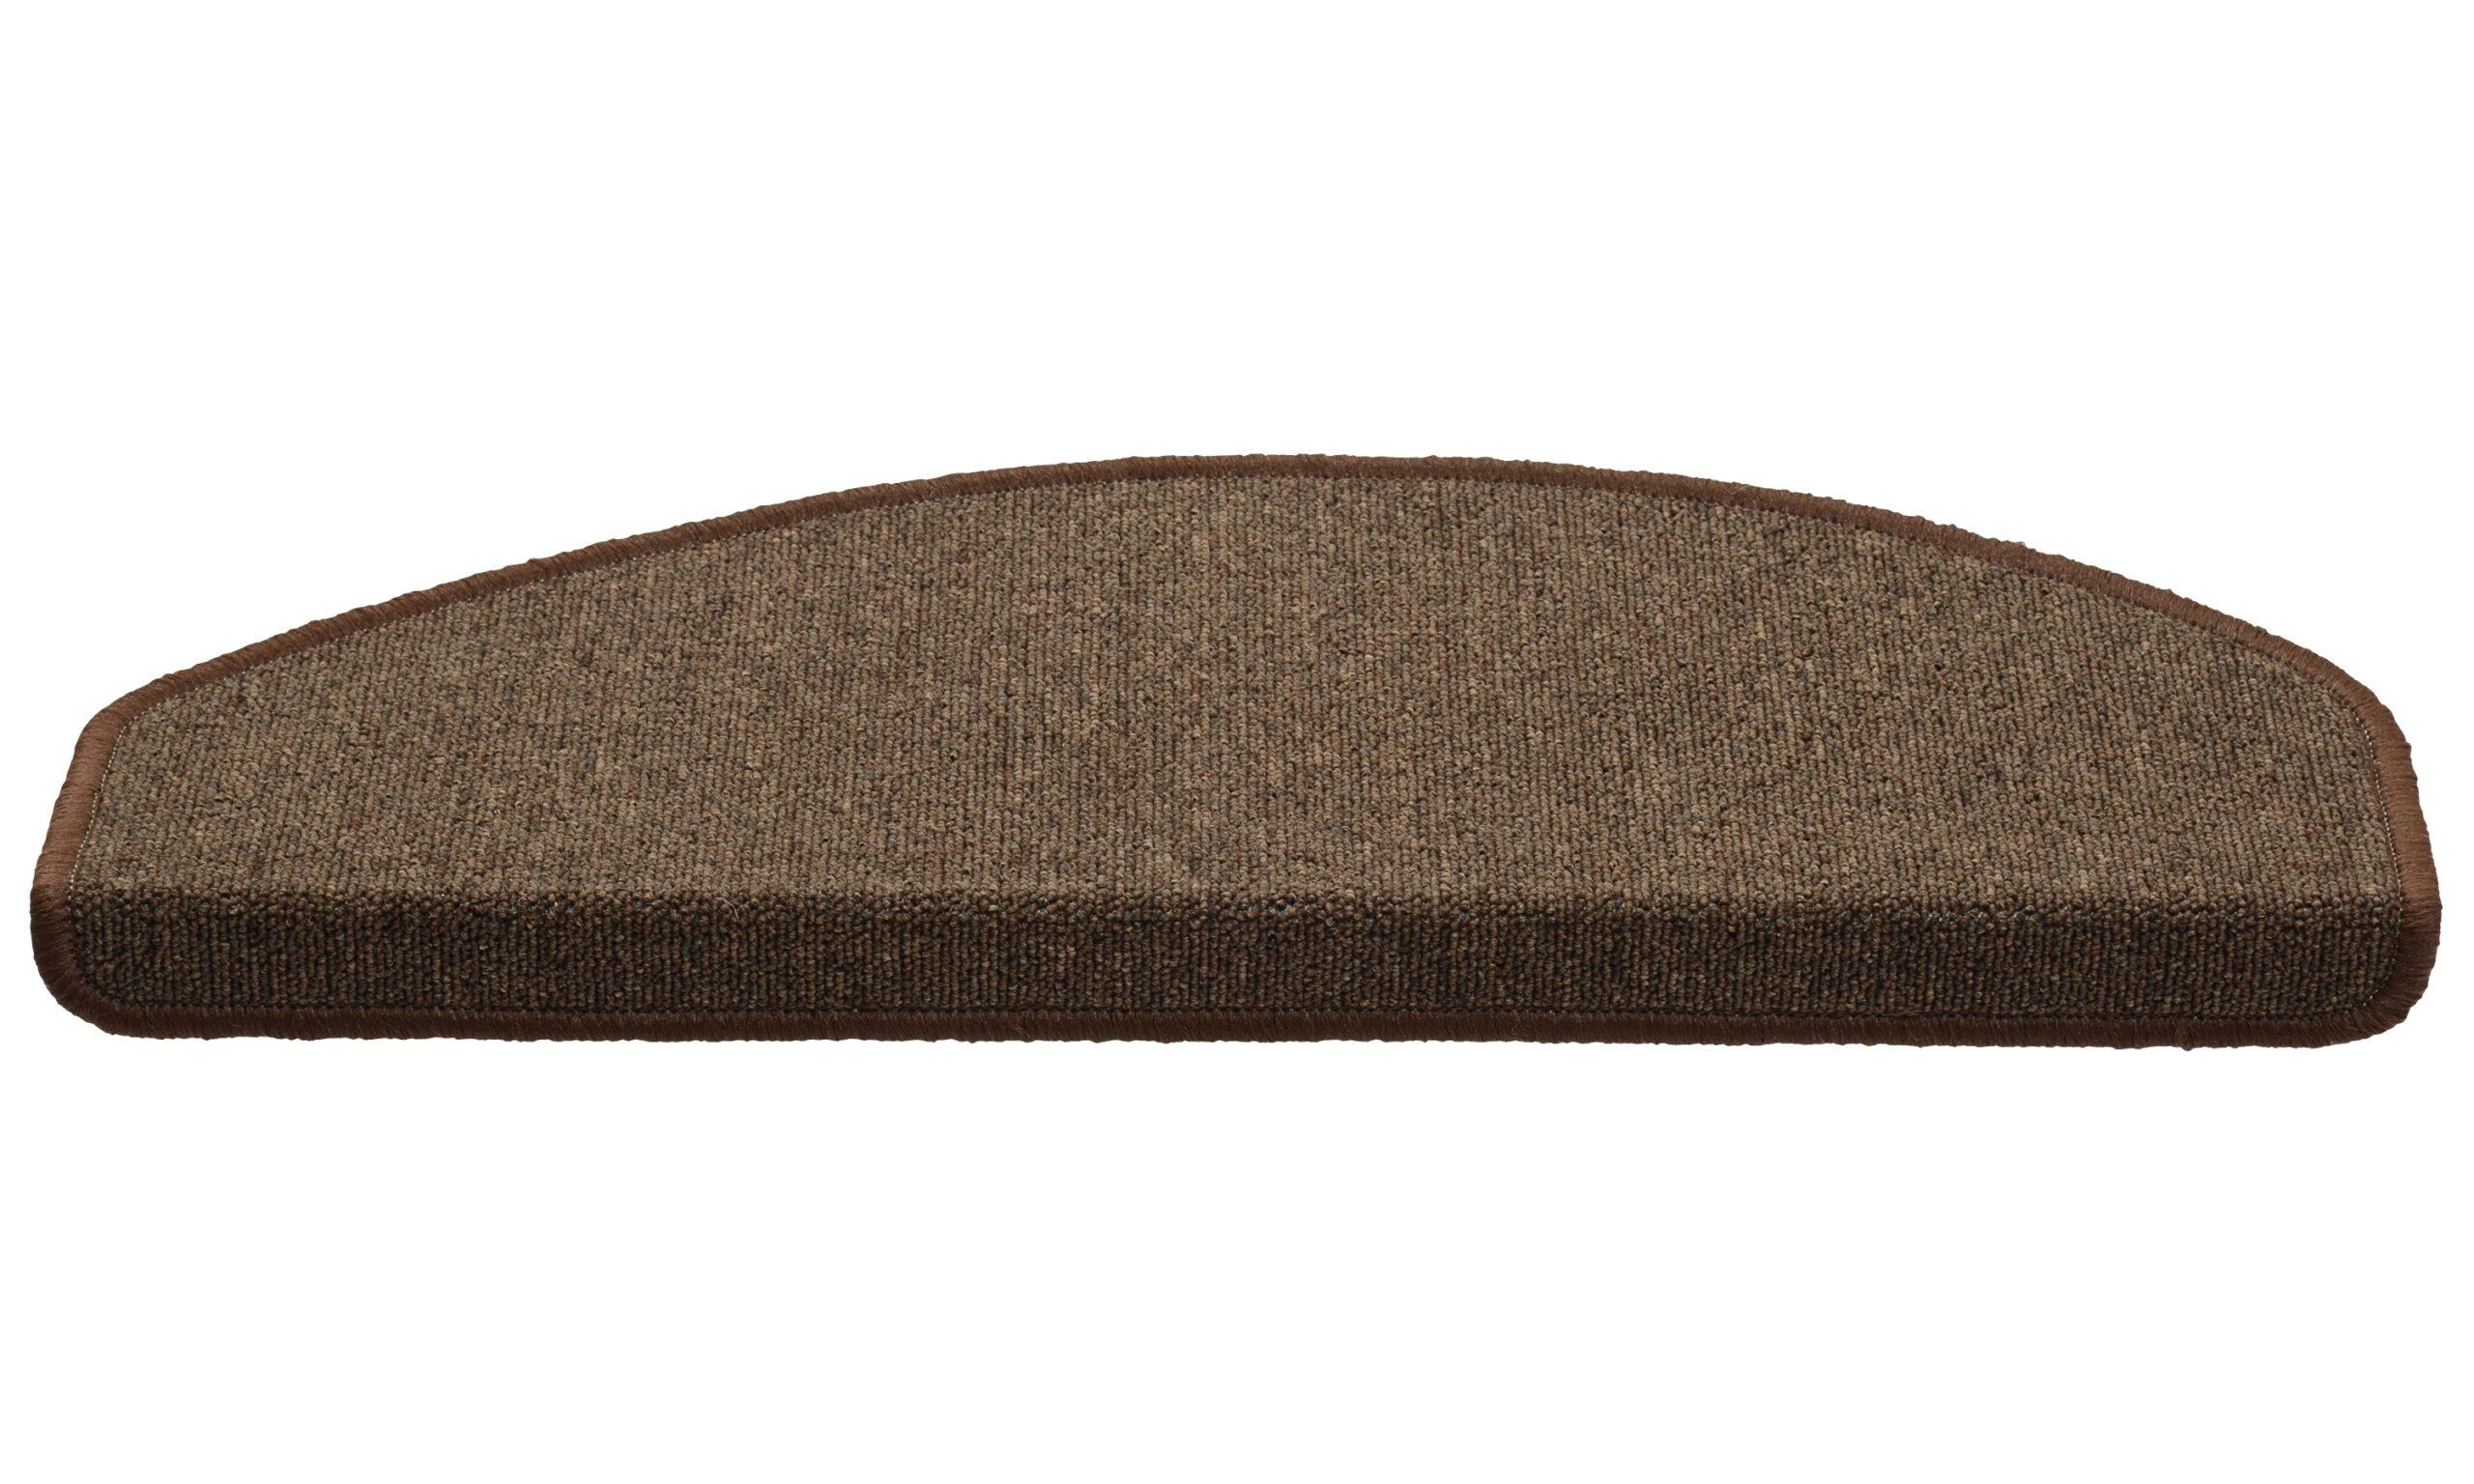 Paris brun - teppe til trapp